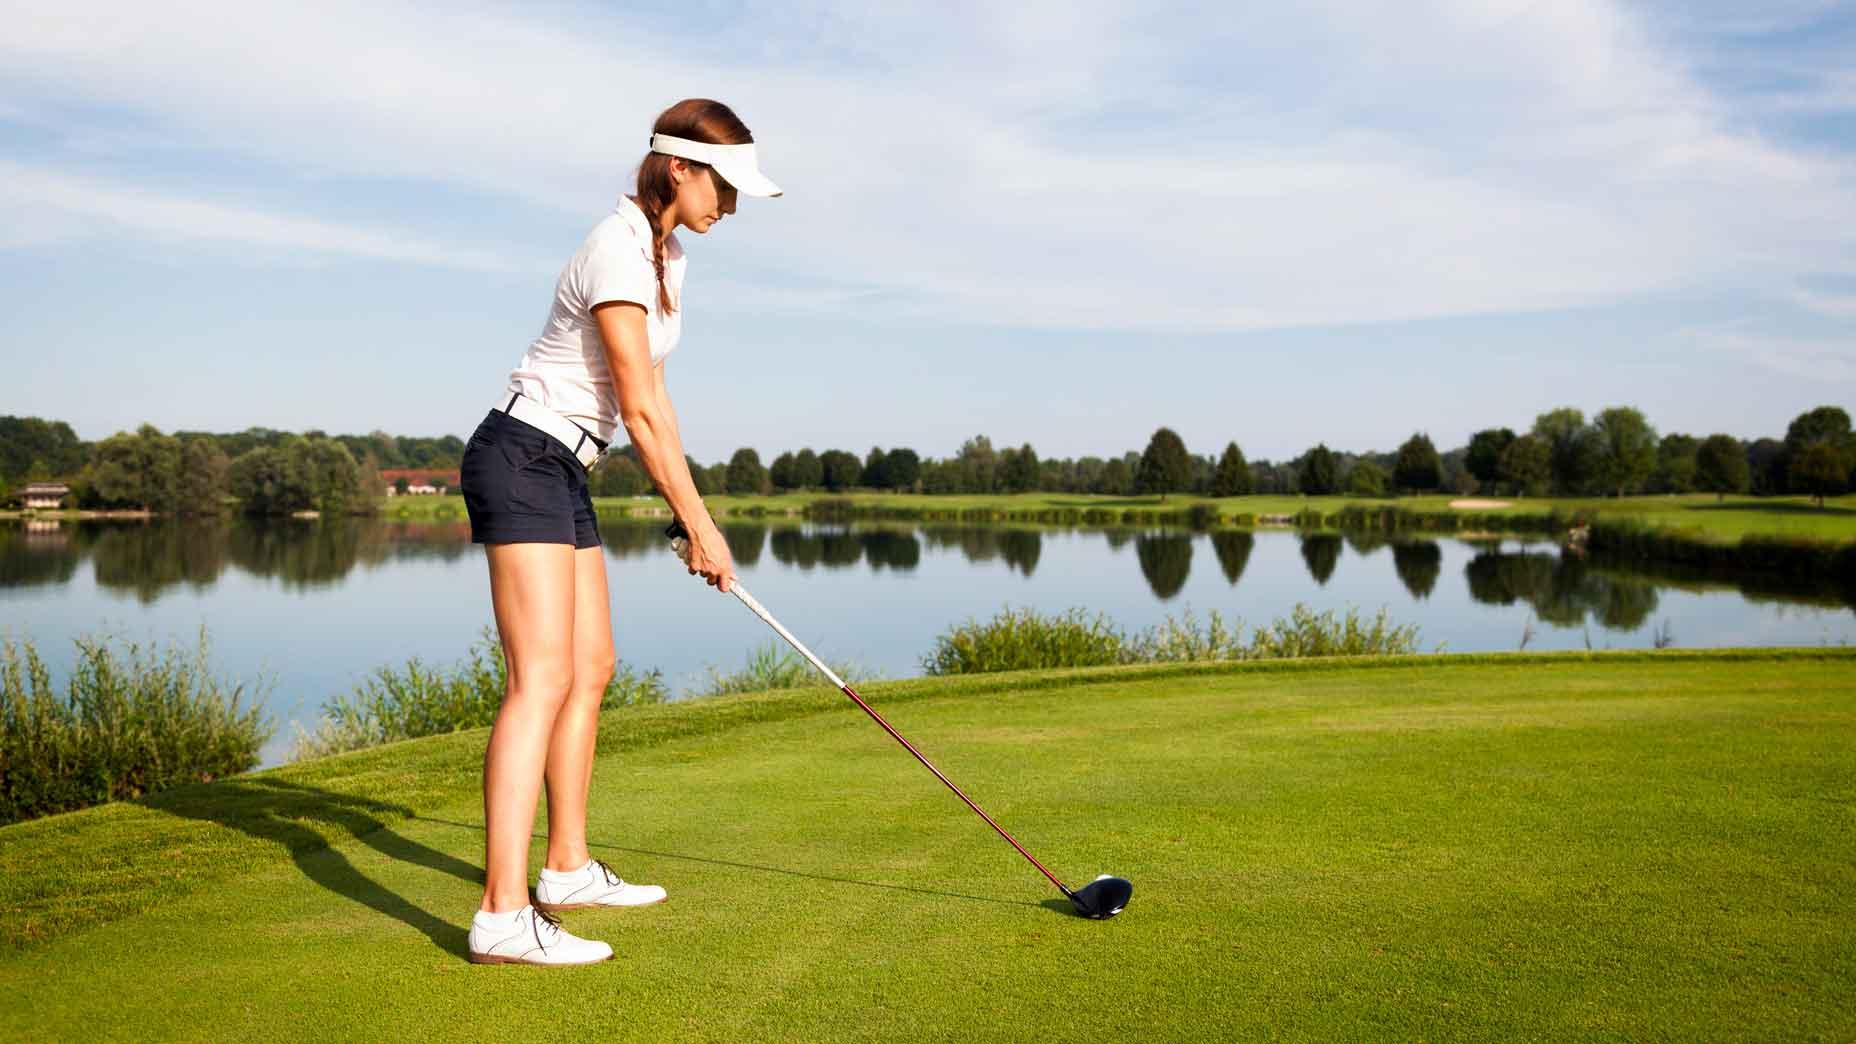 woman golf shot over water